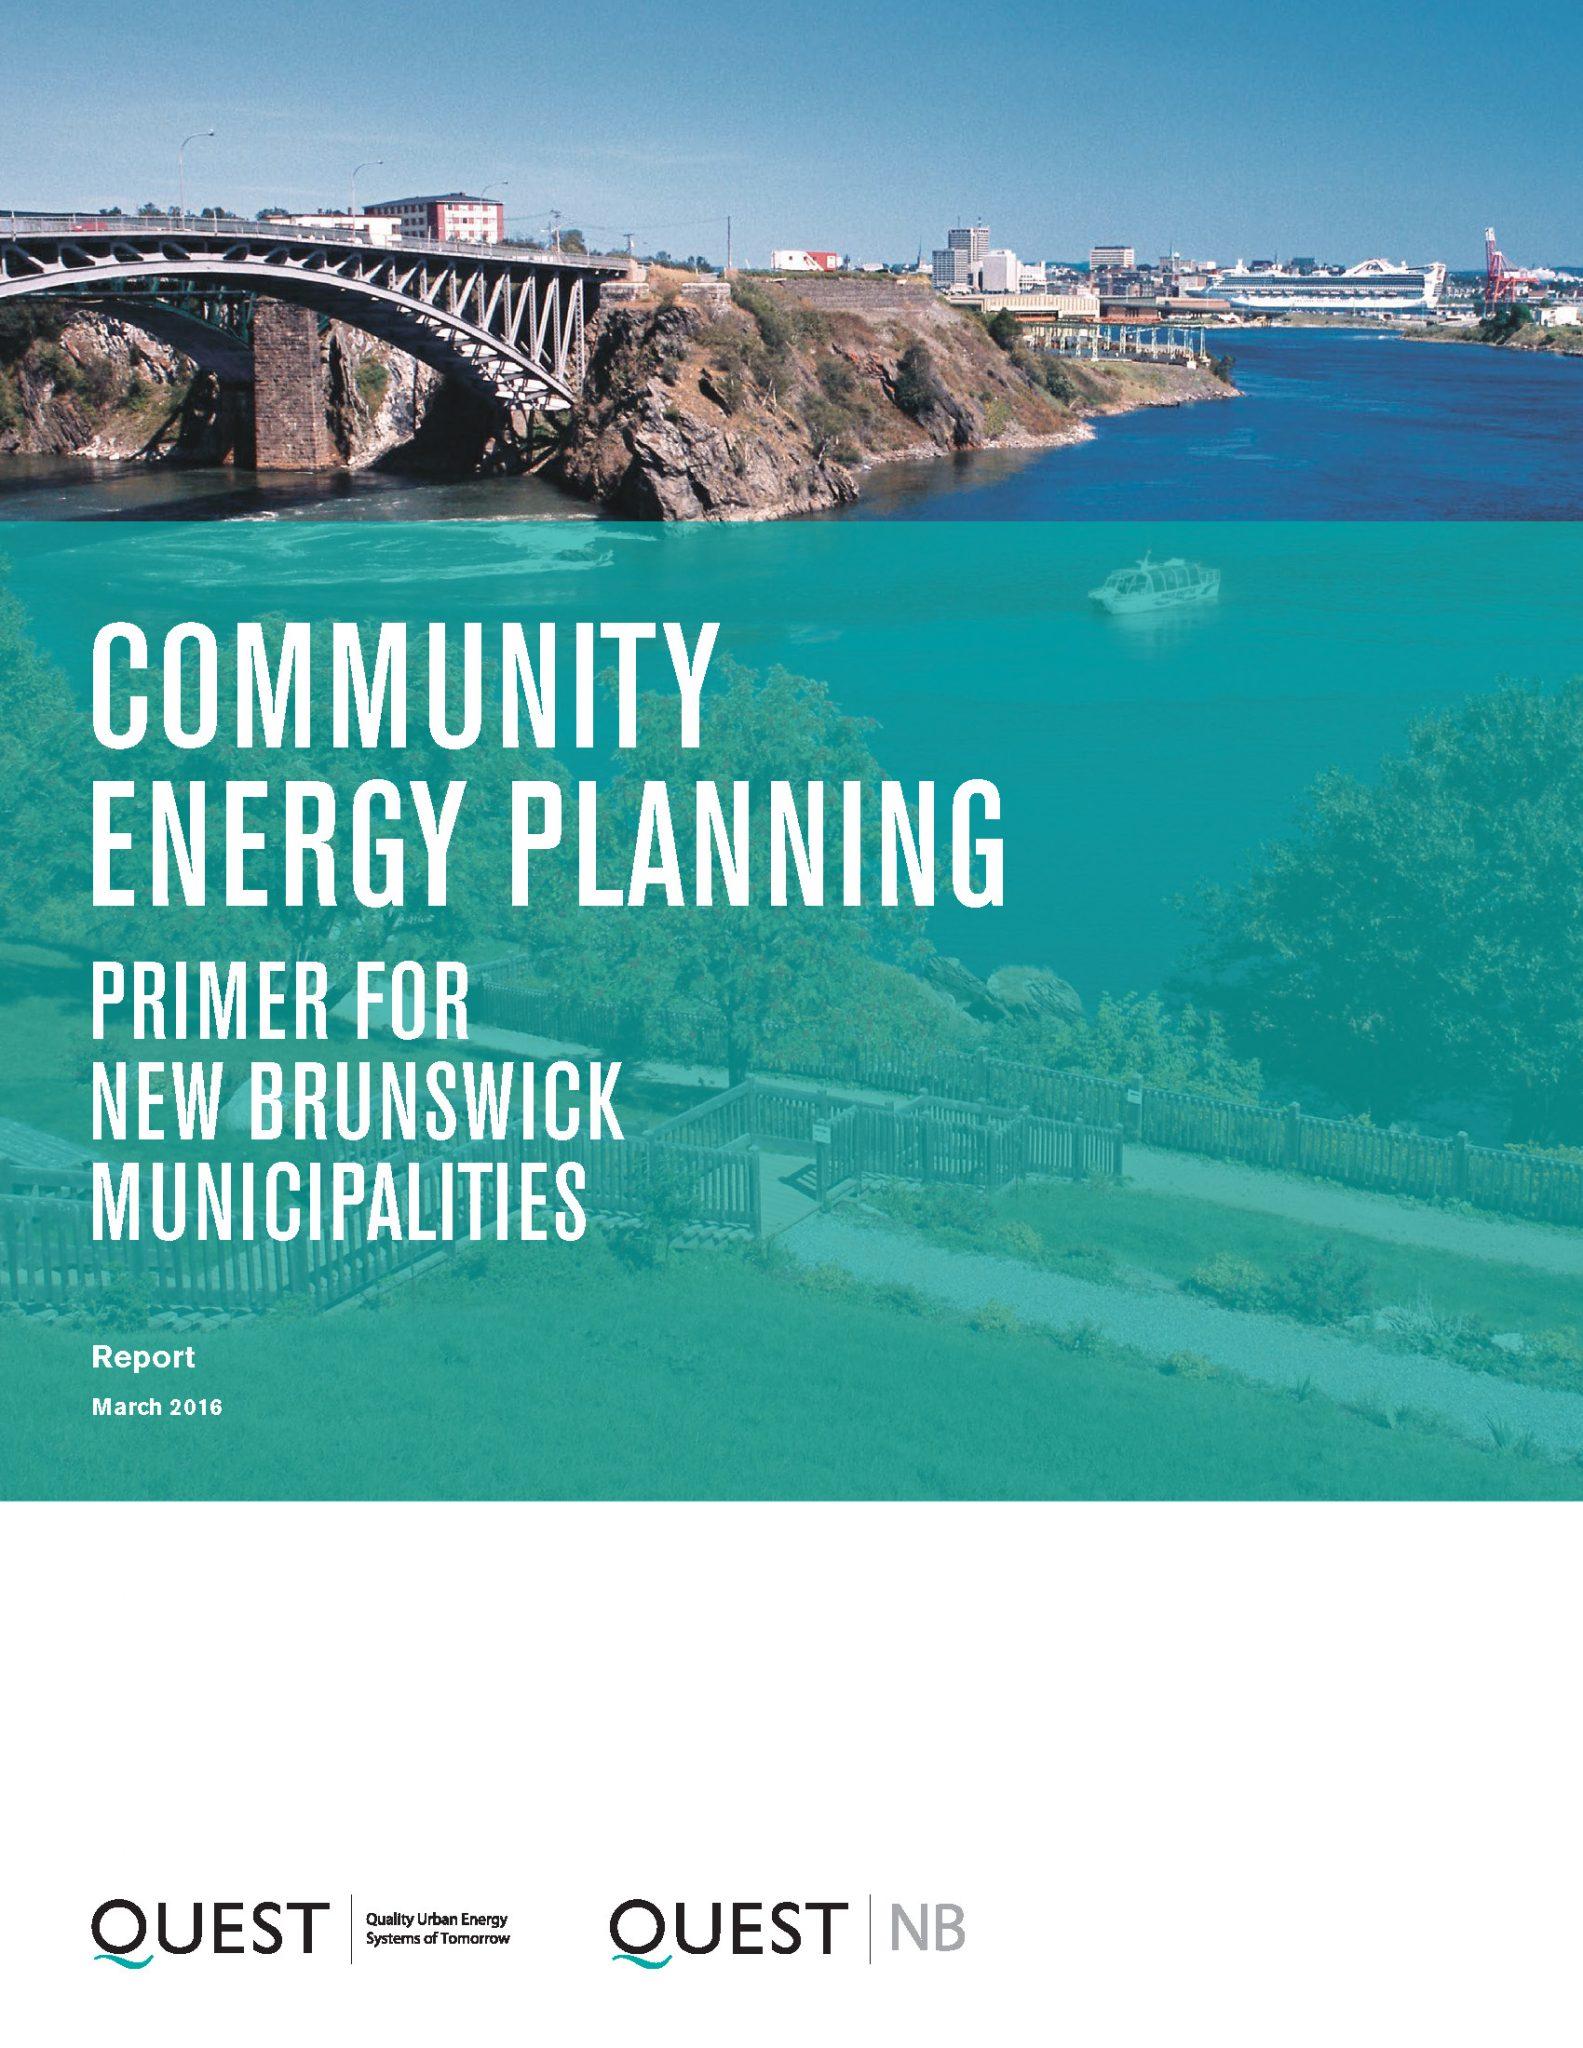 Community Energy Planning: Primer for New Brunswick Municipalities